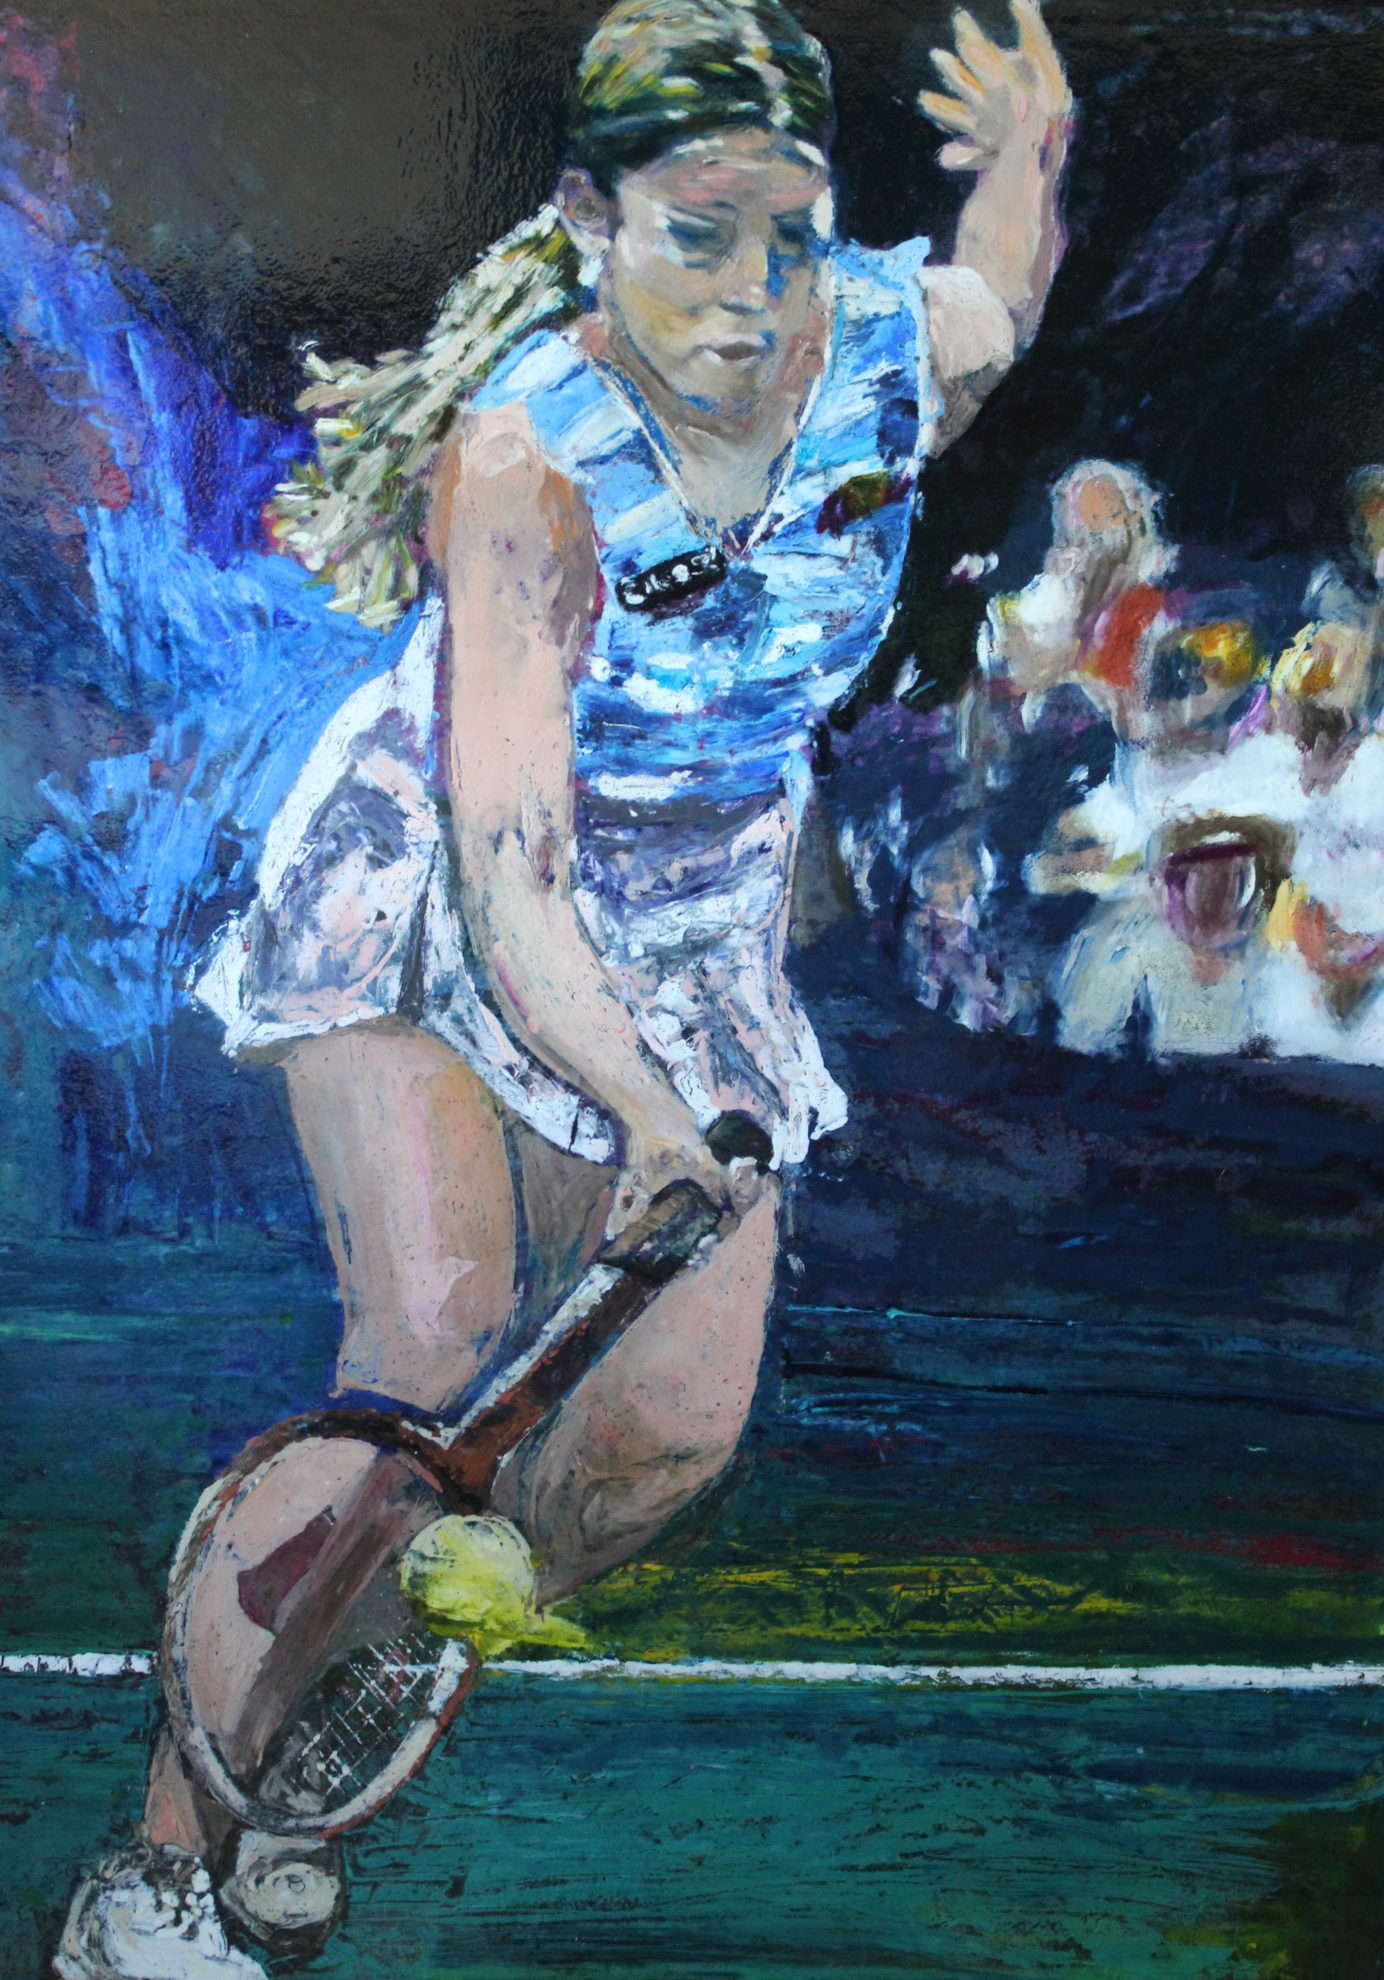 Chrissy Evert, 1982 US Open Champion